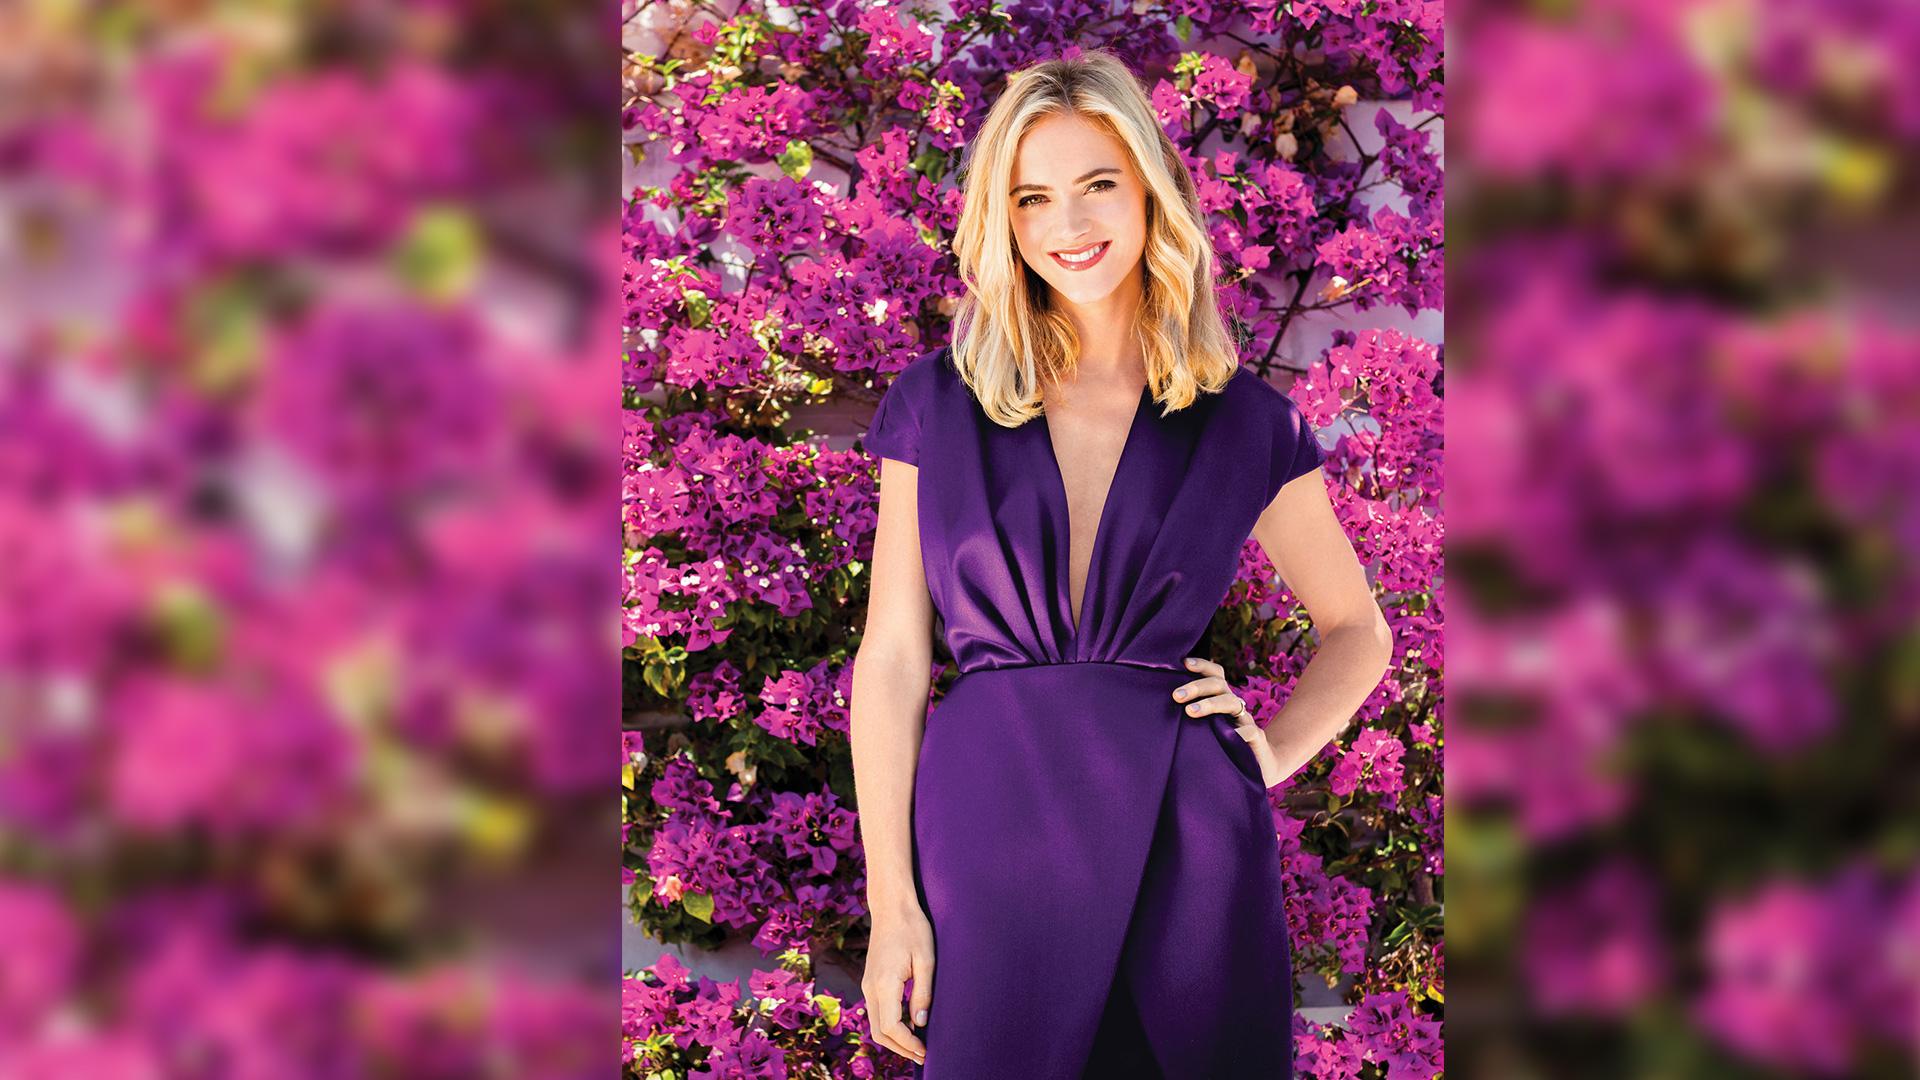 Emily Wickersham looking oh-so-pretty in purple